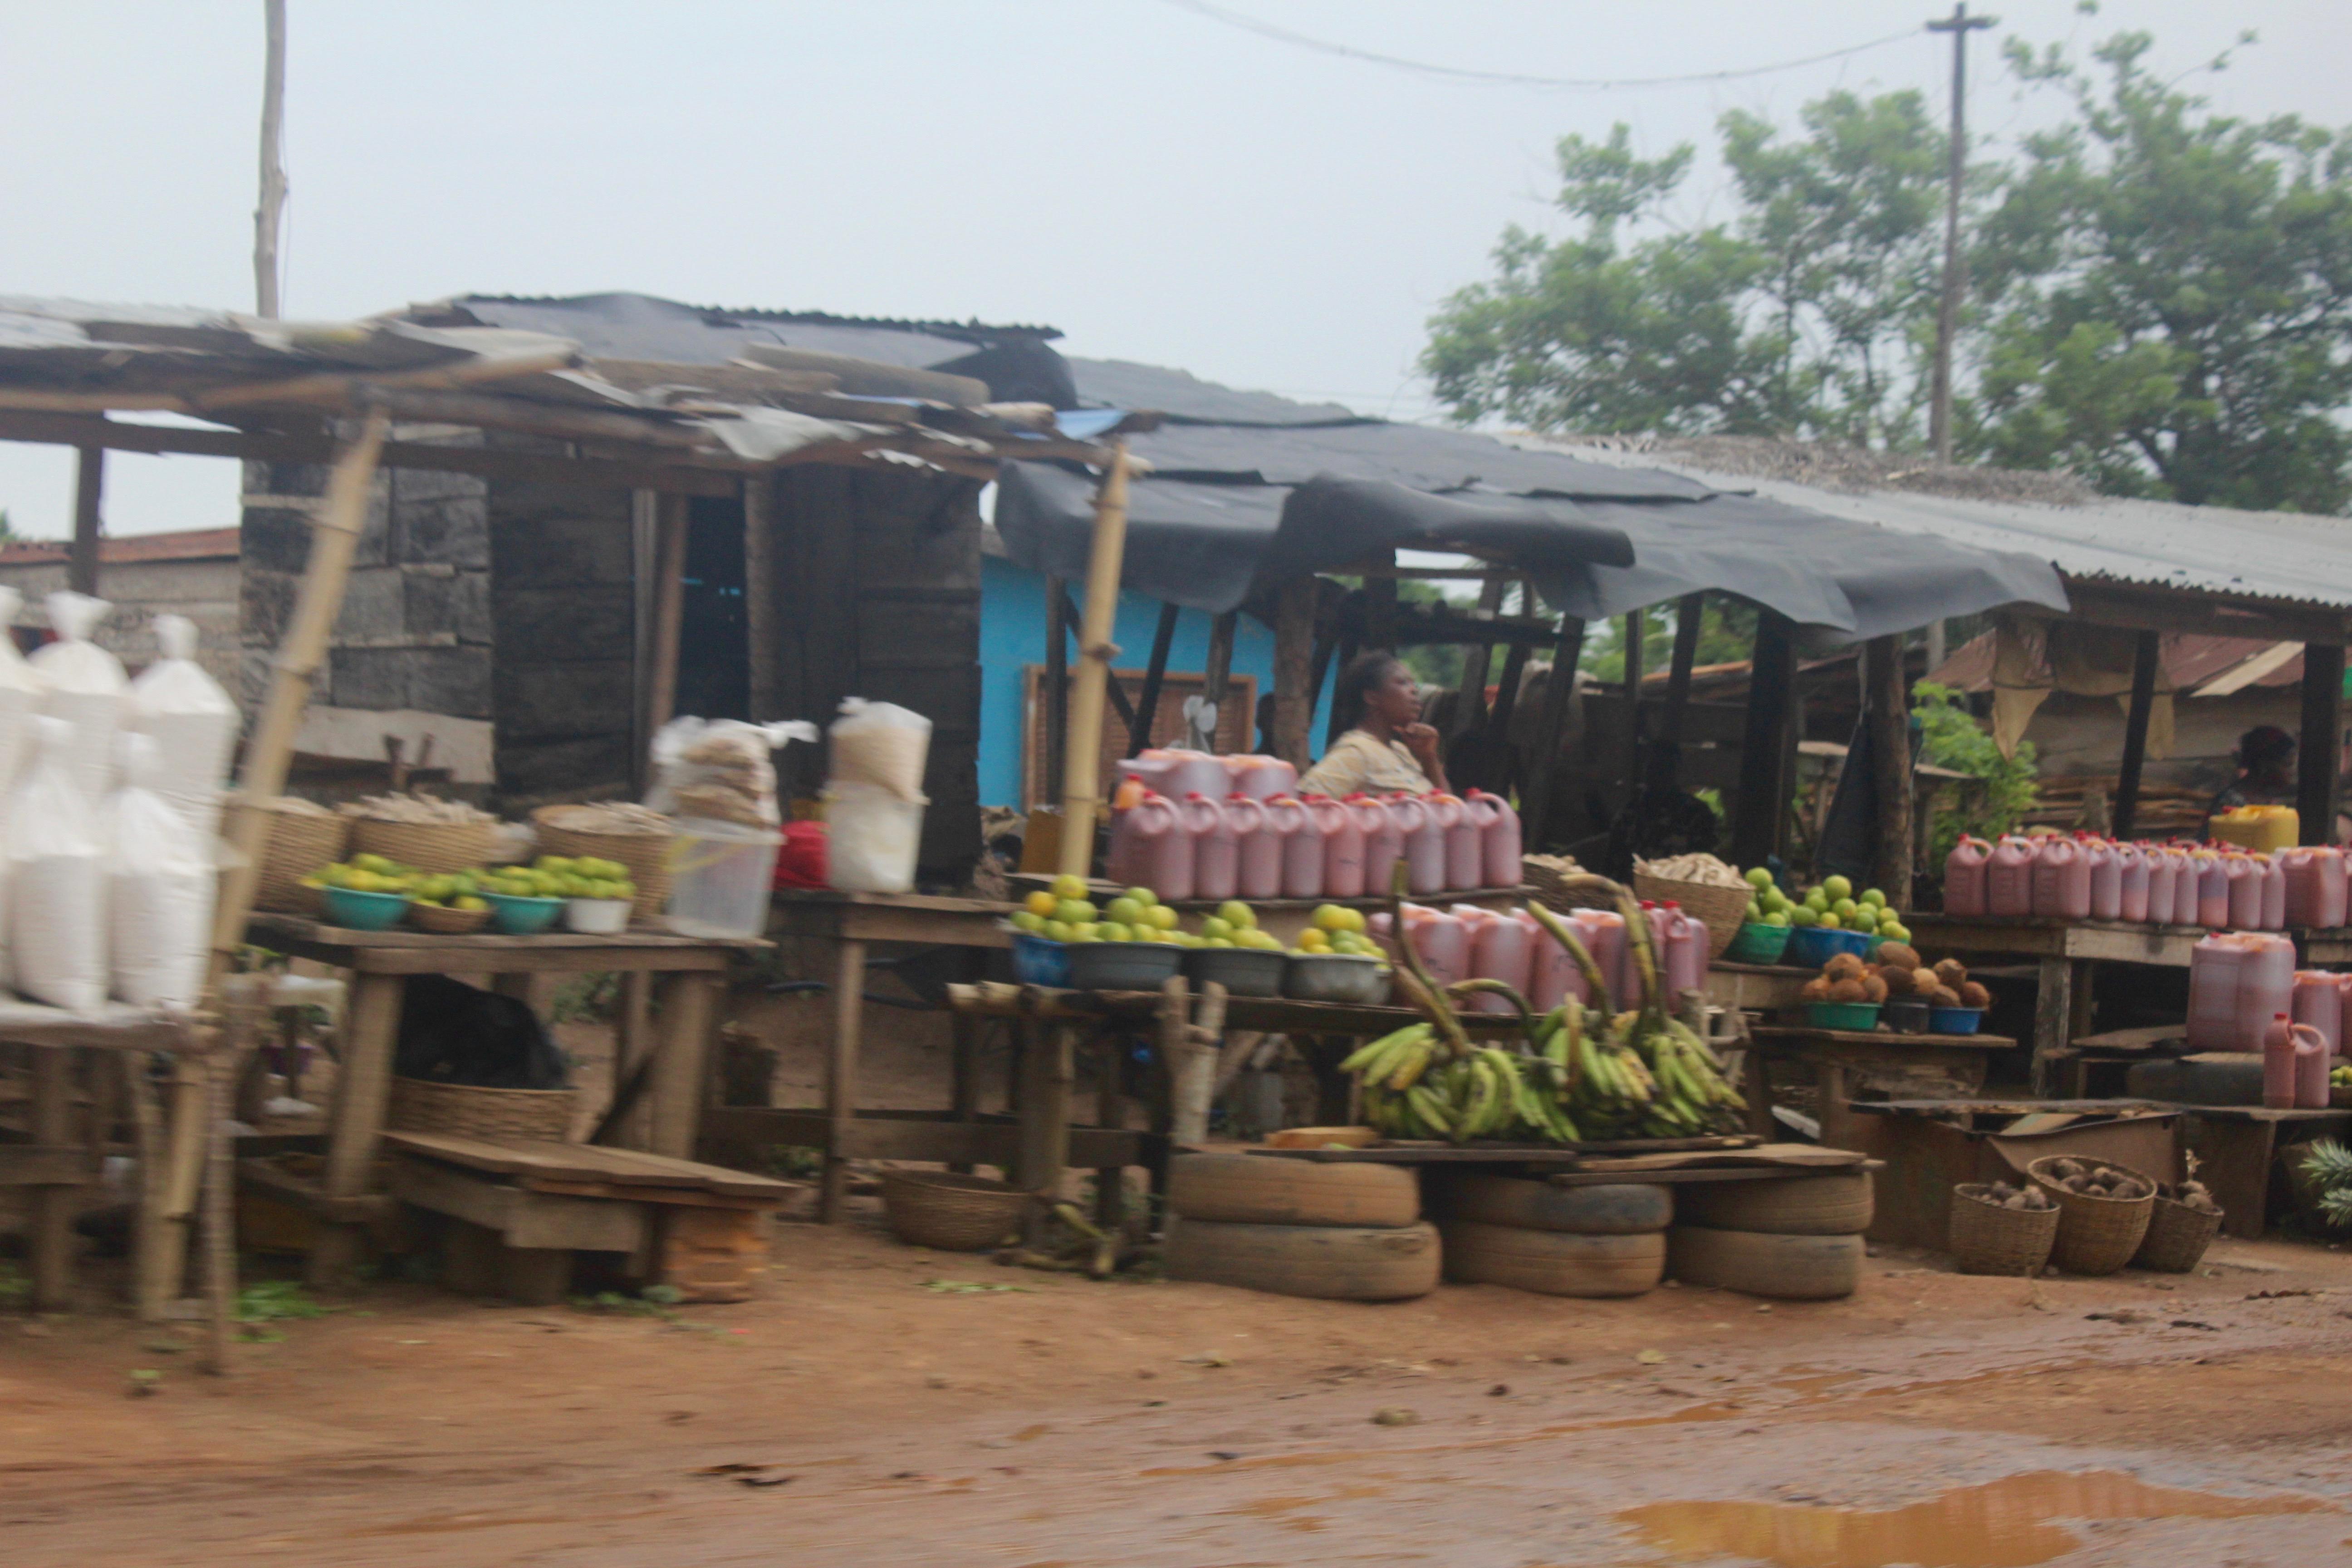 Roadside market in Ondo, Nigeria.